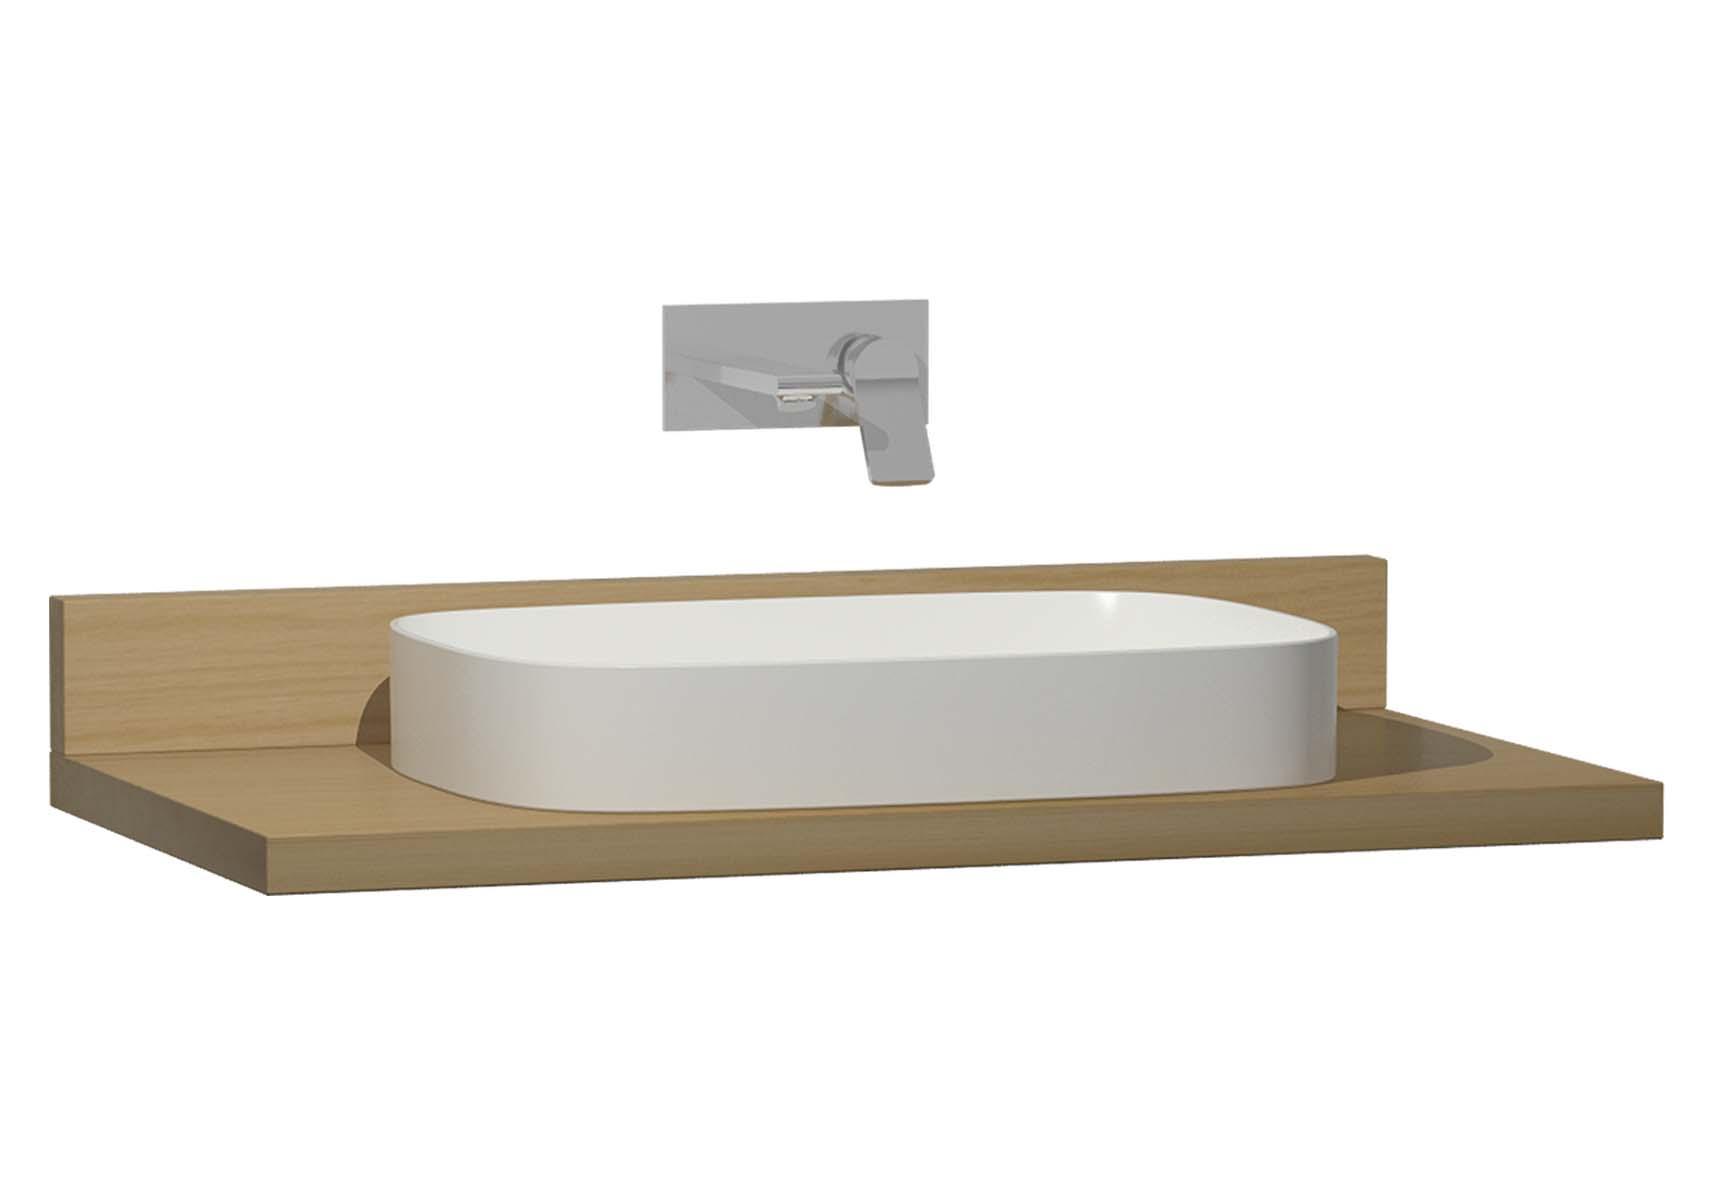 Memoria Black Counter, 120 cm, Patterned Oak, Washbasin Matte White